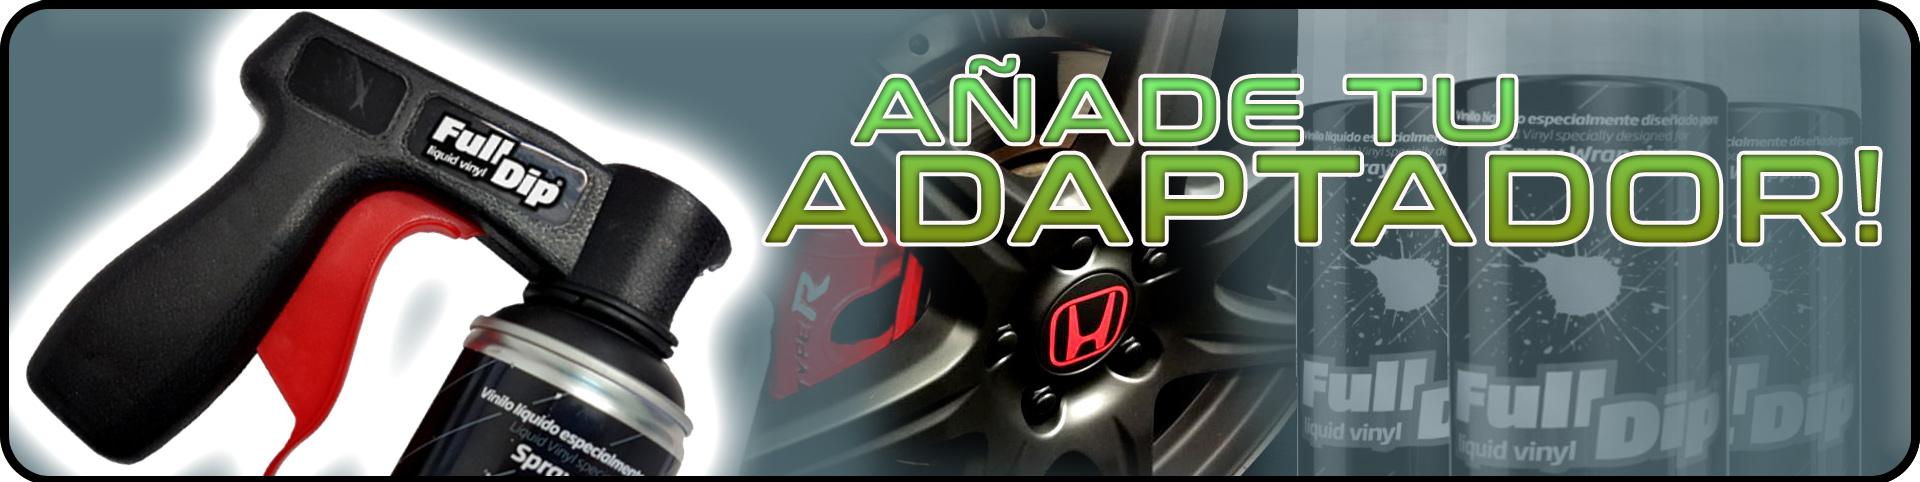 BANNER-ADAPTADOR-FINAL.jpg